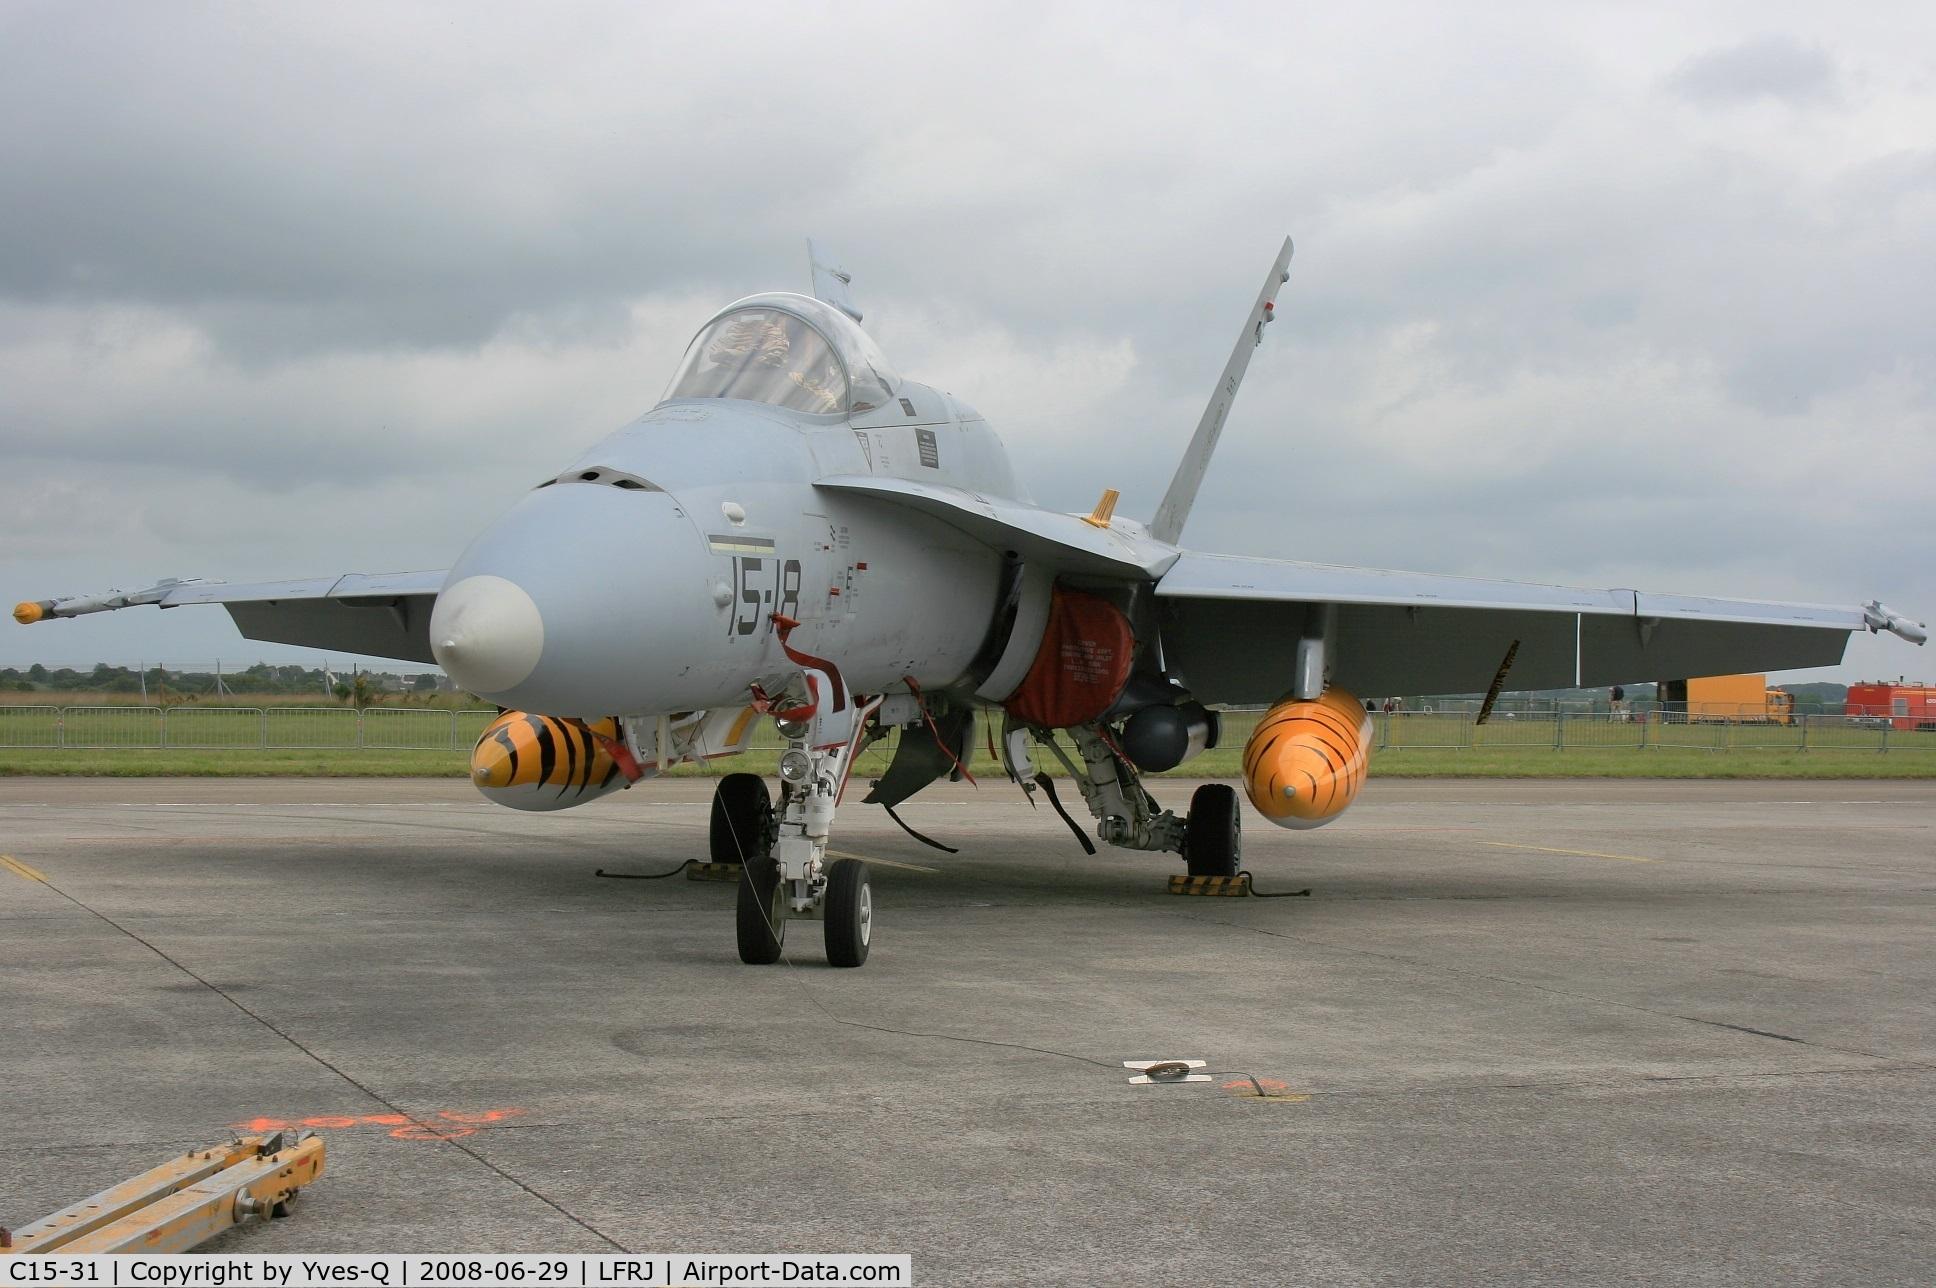 C15-31, McDonnell Douglas EF-18A Hornet C/N 0533/A442, Spanish Air Force McDonnell Douglas EF-18A Hornet, Landivisiau Naval Air Base (LFRJ) Open day Tiger Meet 2008